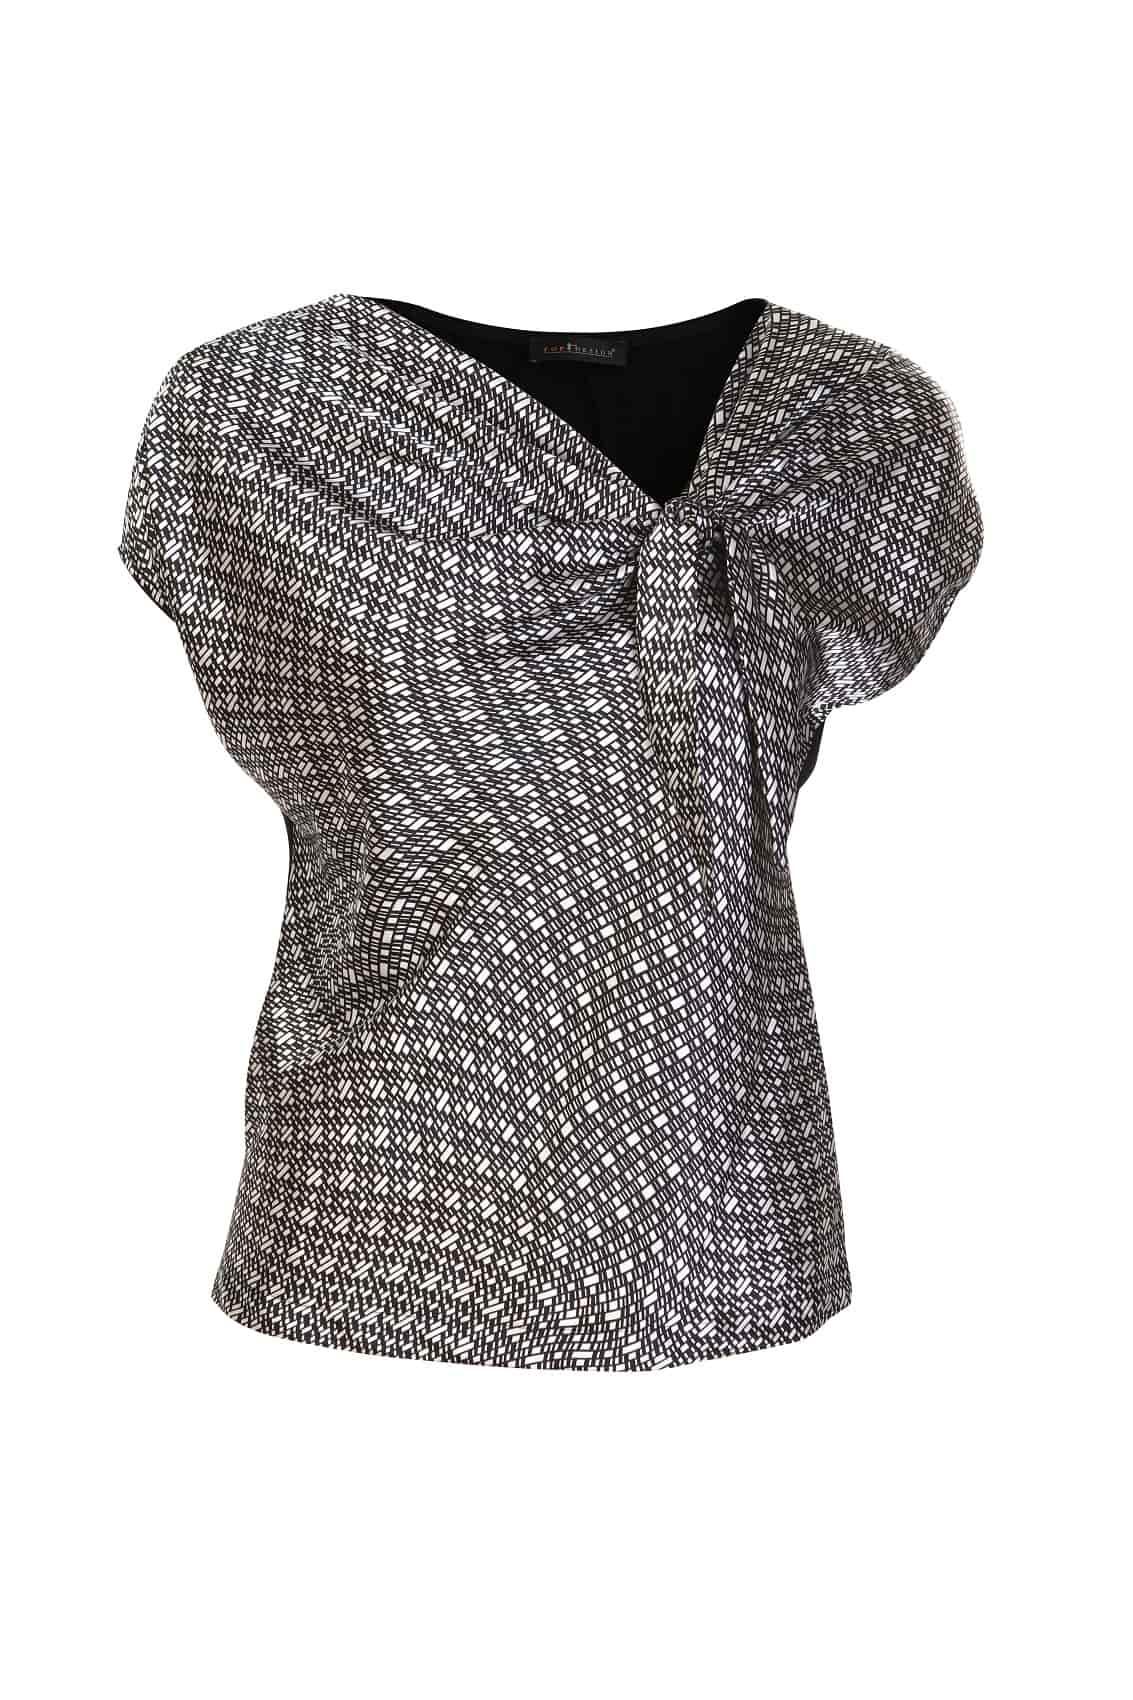 Эффектная блузка под юбку  Top Design A7 044